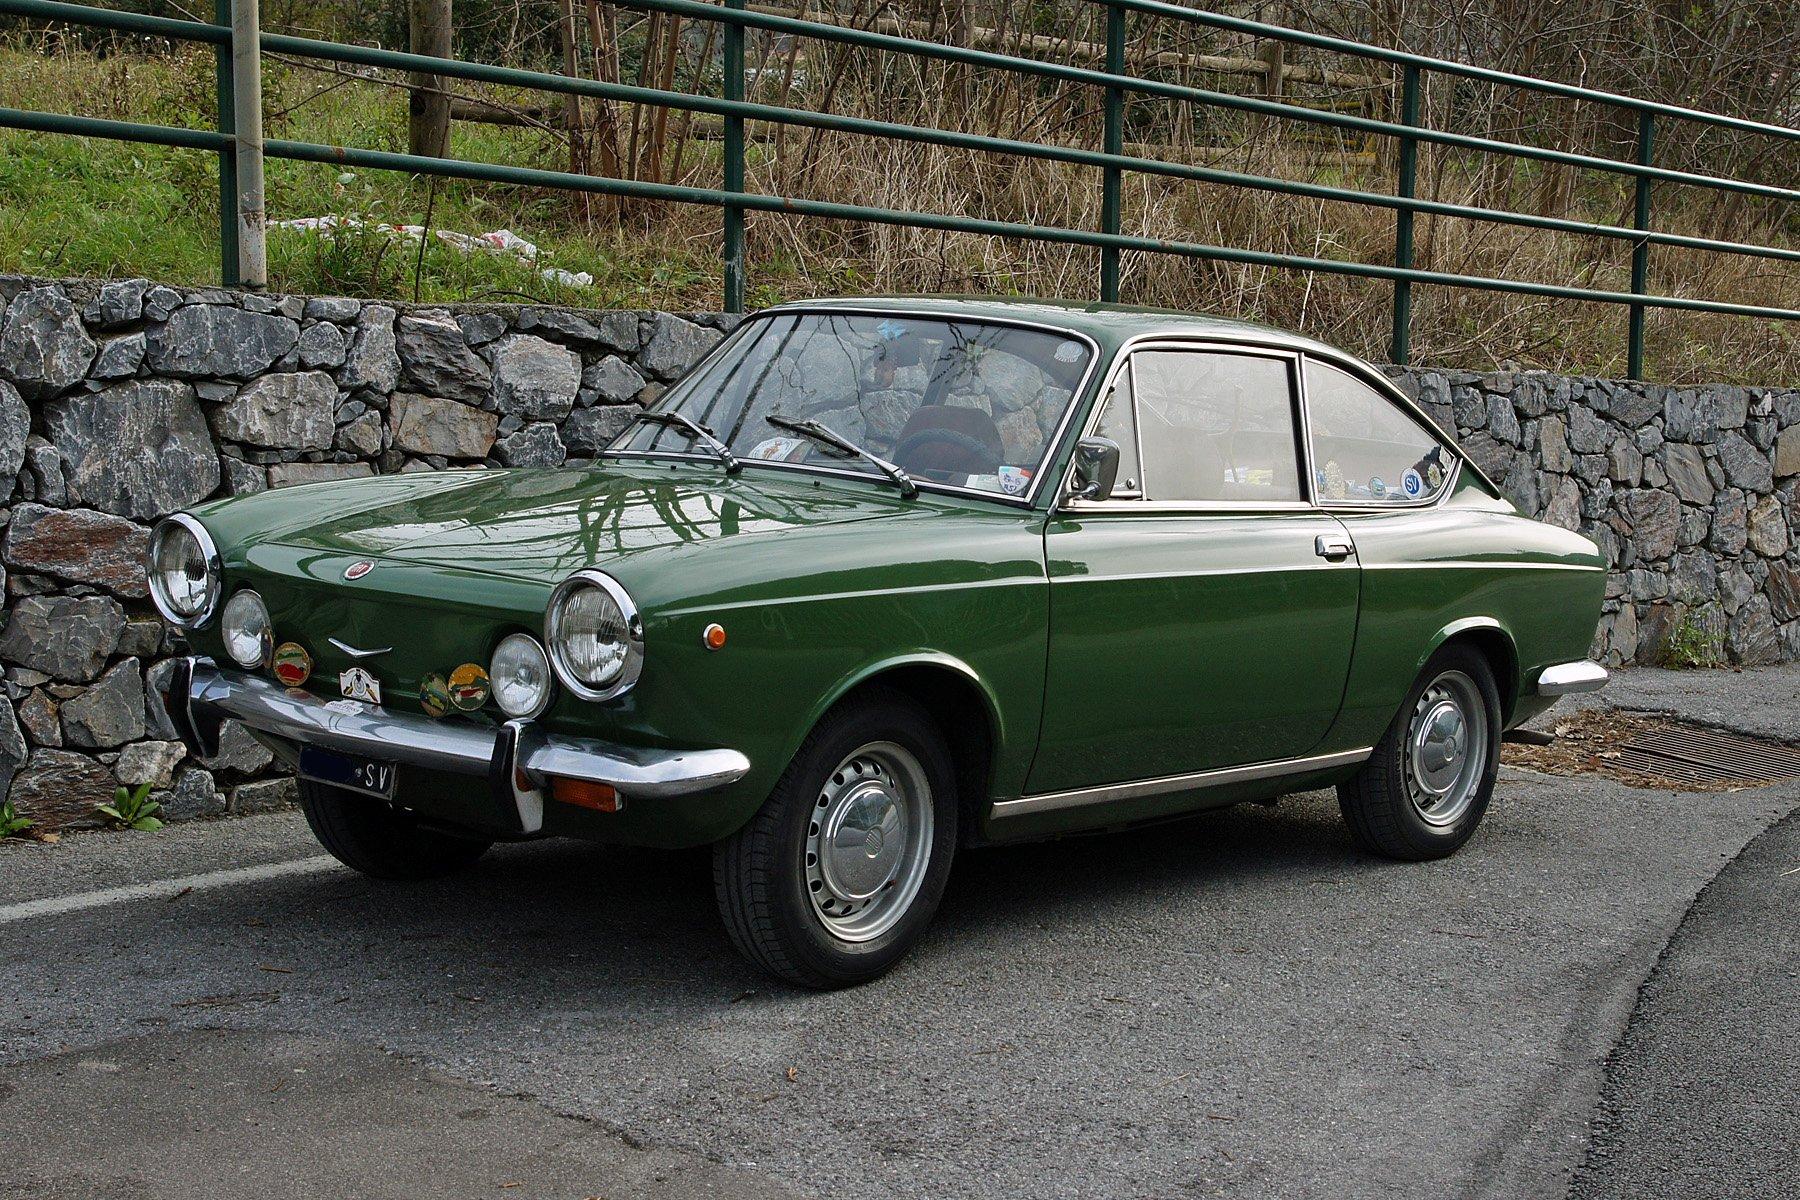 fiat 850 sport coupe classic cars italia wallpaper 1800x1200 604121 wallpaperup. Black Bedroom Furniture Sets. Home Design Ideas